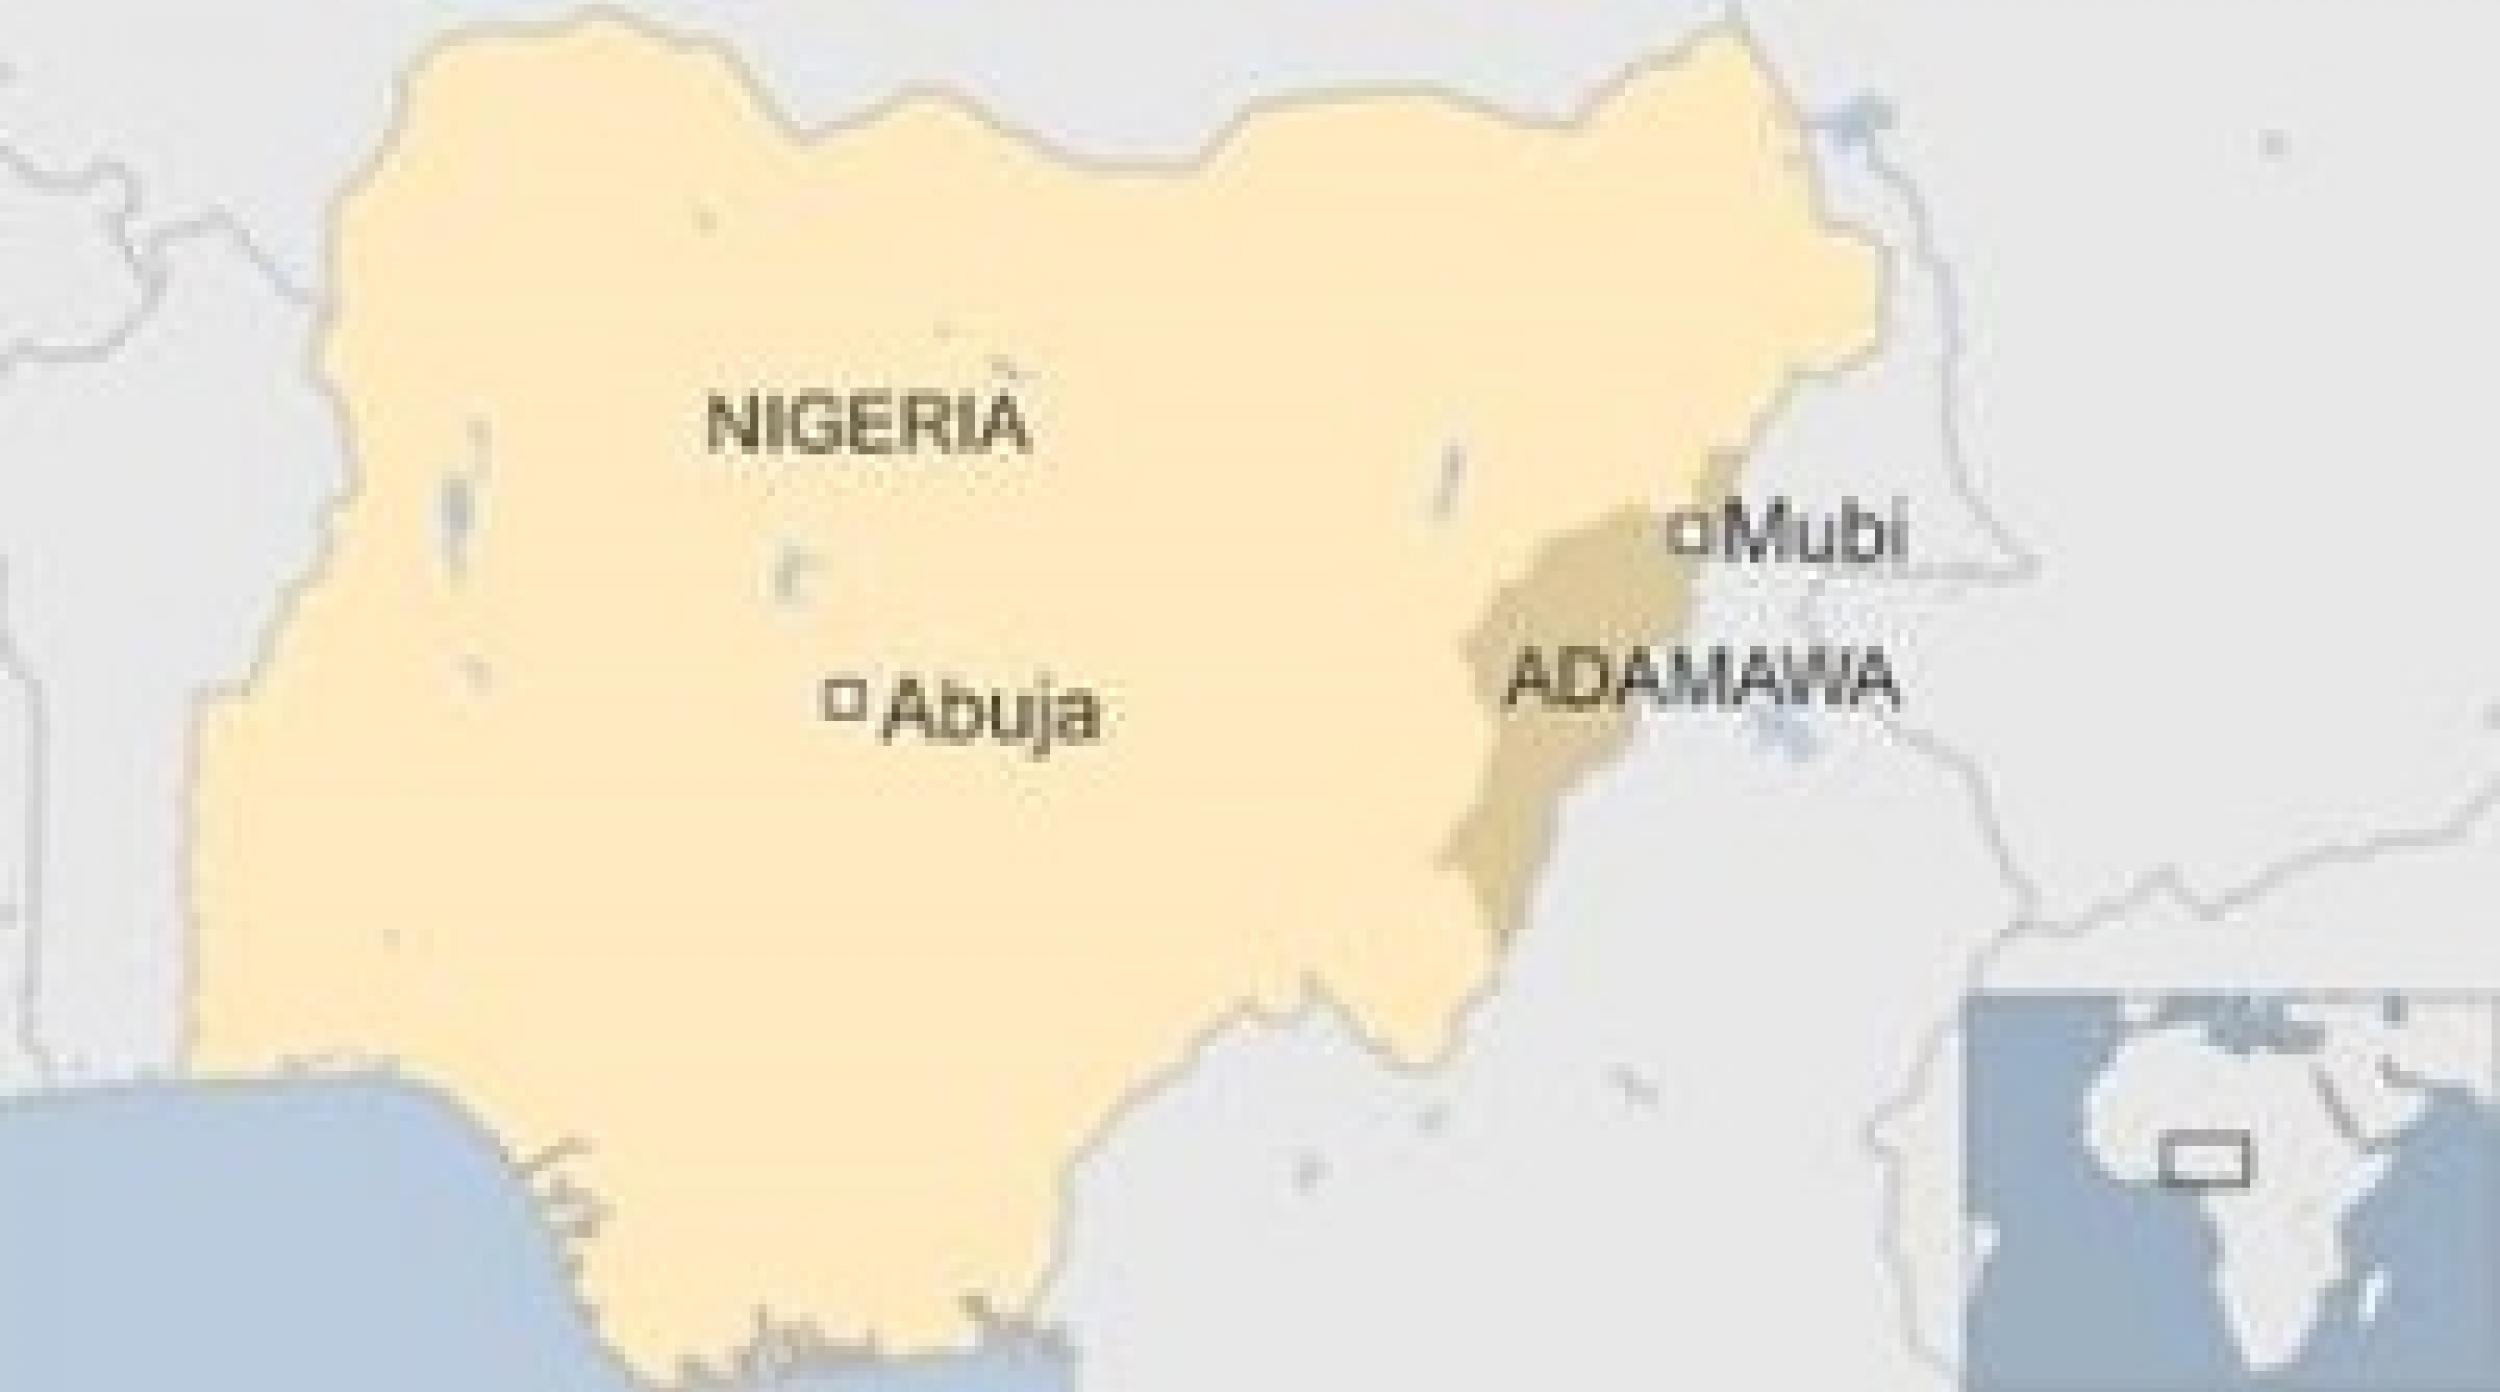 NEWS: በናይጀሪያ በደረሰ የአጥፍቶ መጥፋት ጥቃት በትንሹ 50 ሰዎች ተገደሉ - Nigeria Suicide Bombing Kills 50 in Adamawa State